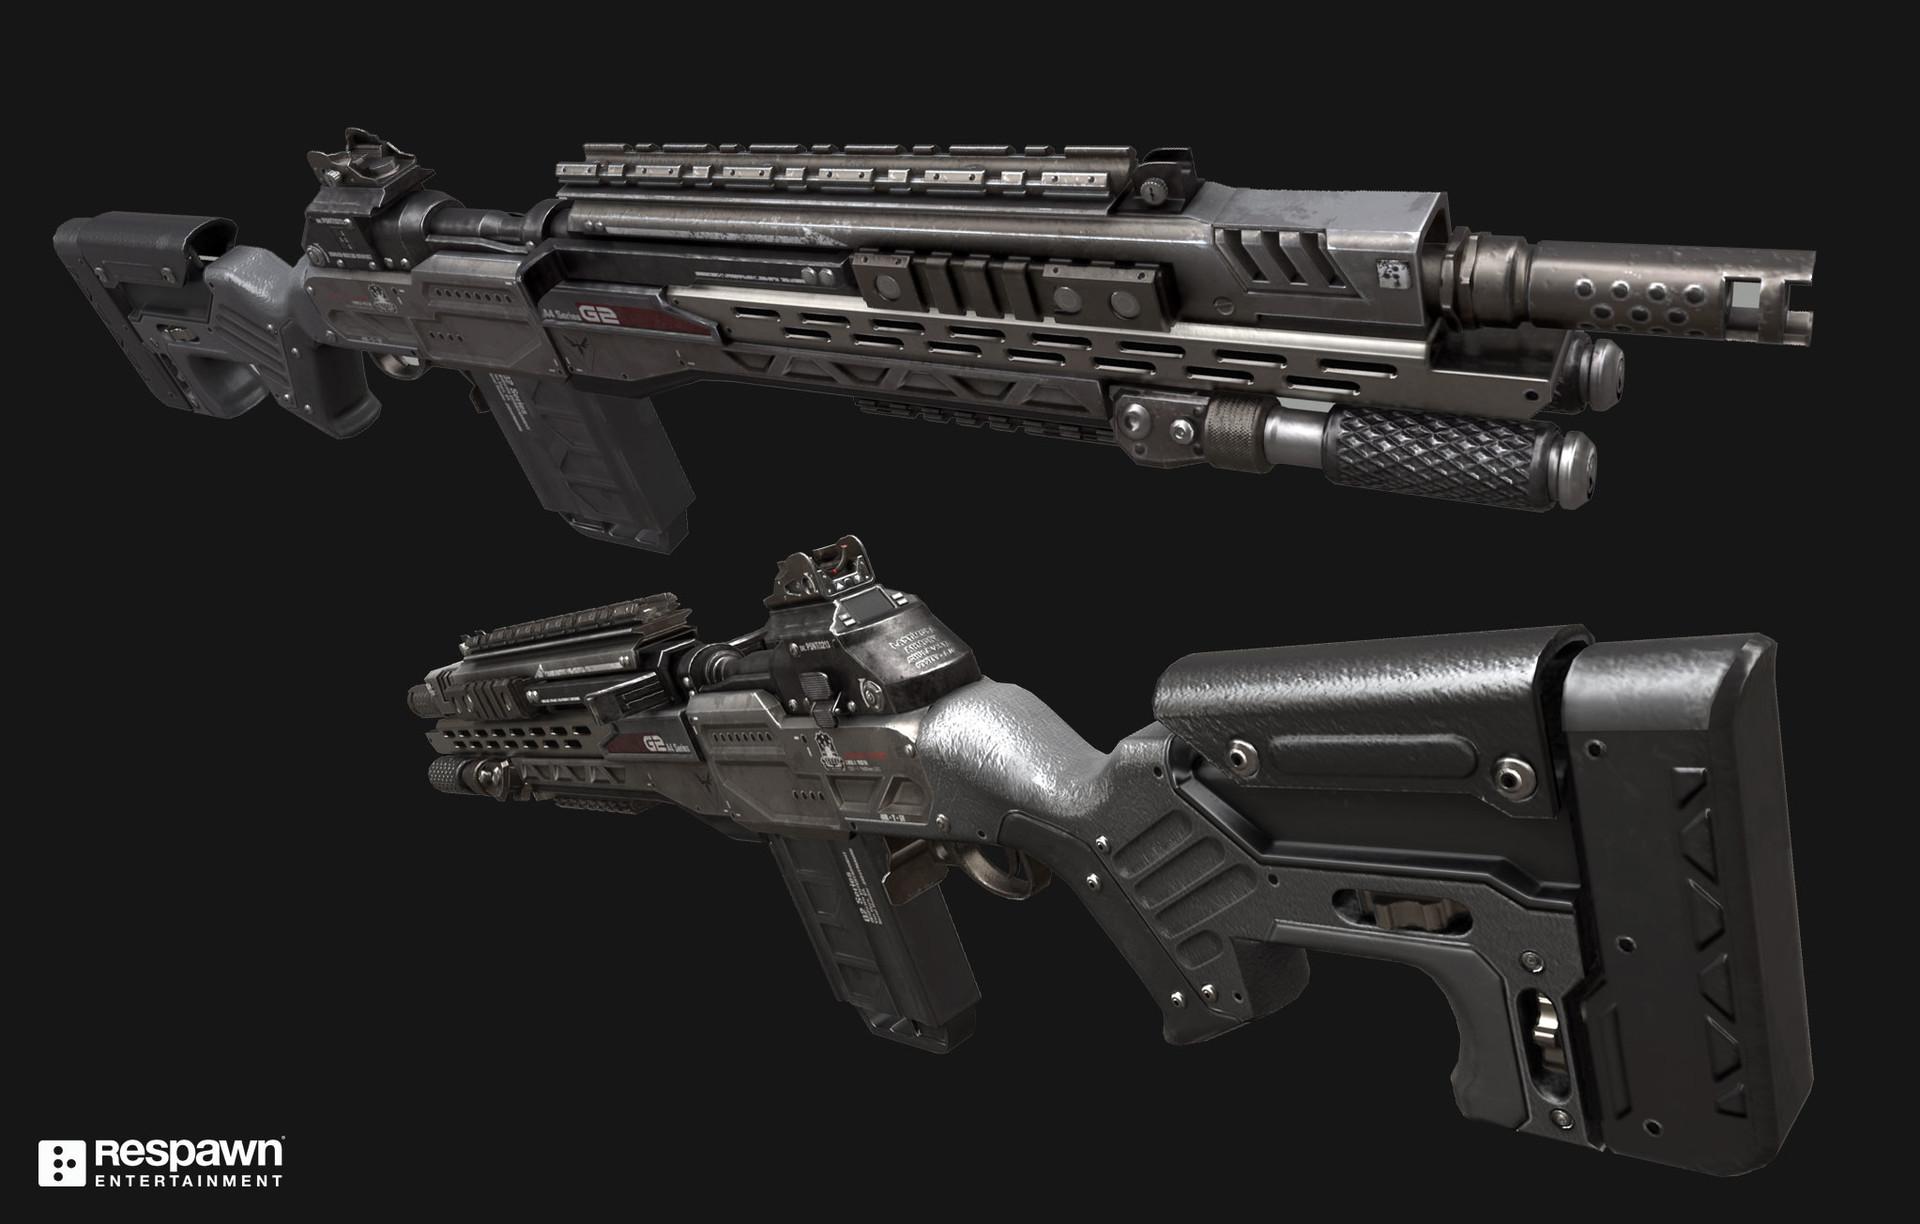 Ryan Lastimosa - Titanfall 2 G2A5 Battle Rifle